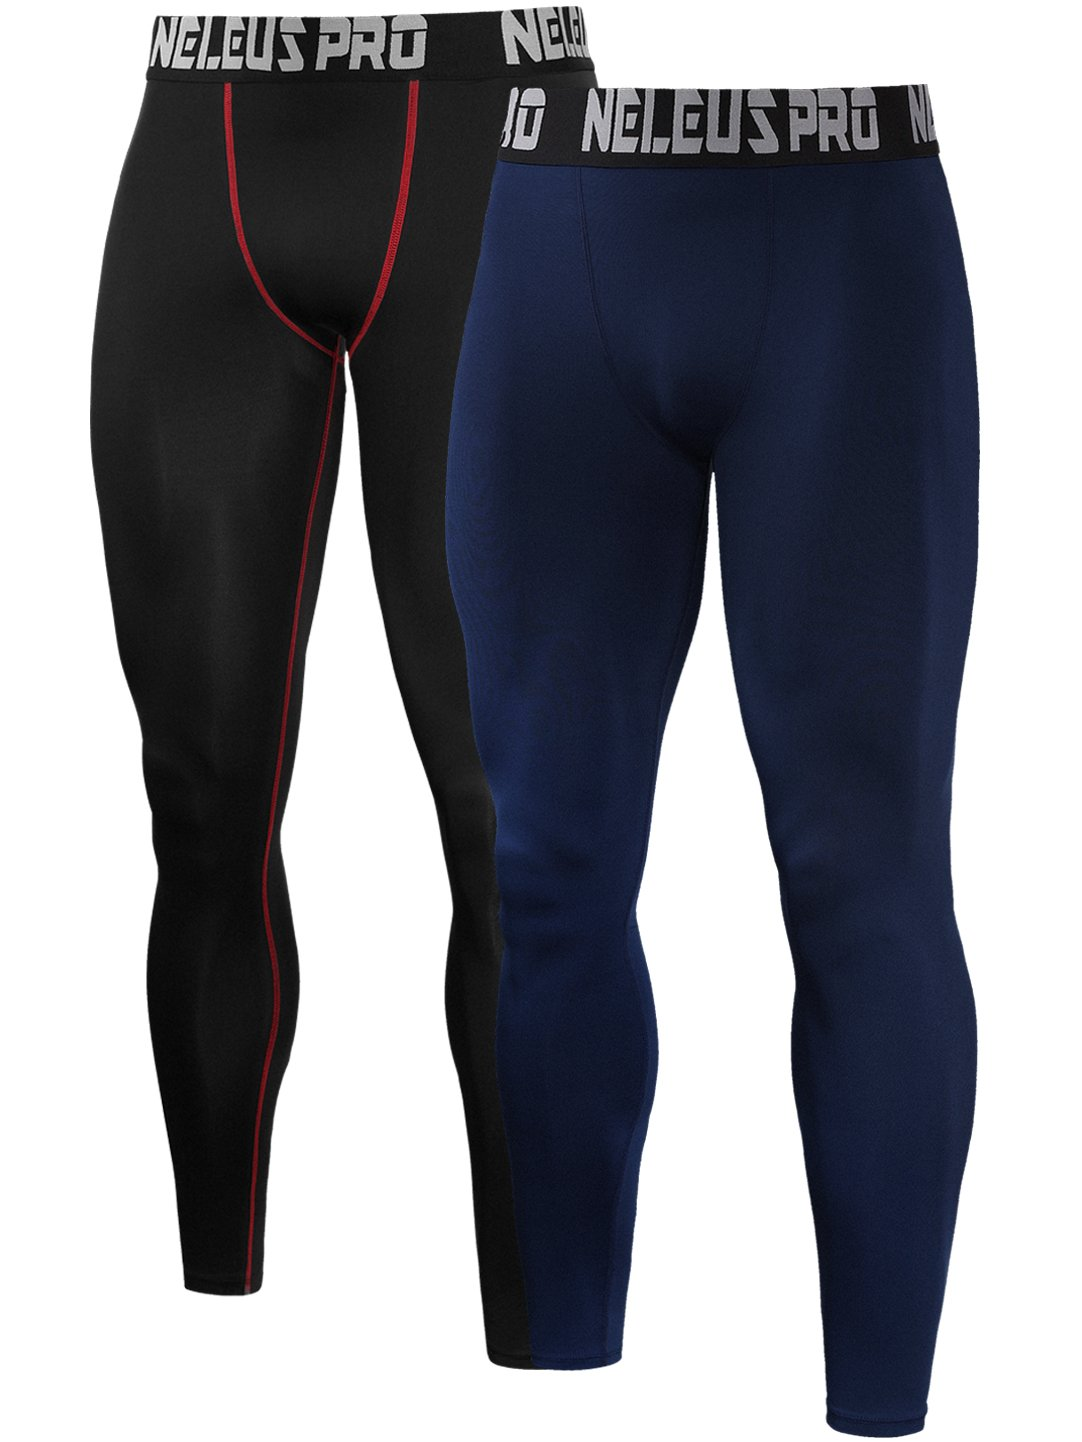 Neleus Men's 2 Pack Compression Tights Sport Running Leggings Pants DK6013-2